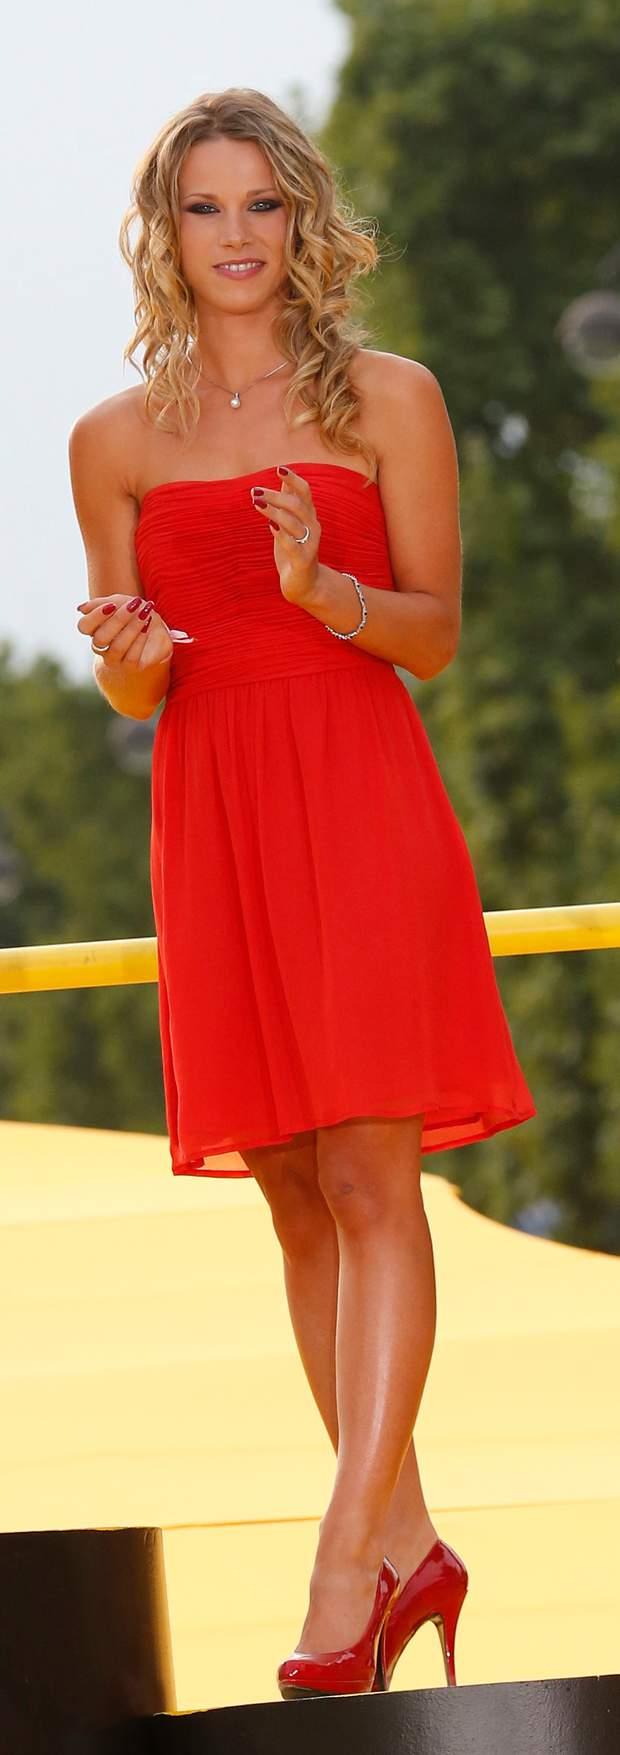 Marion Rousse en mini-robe